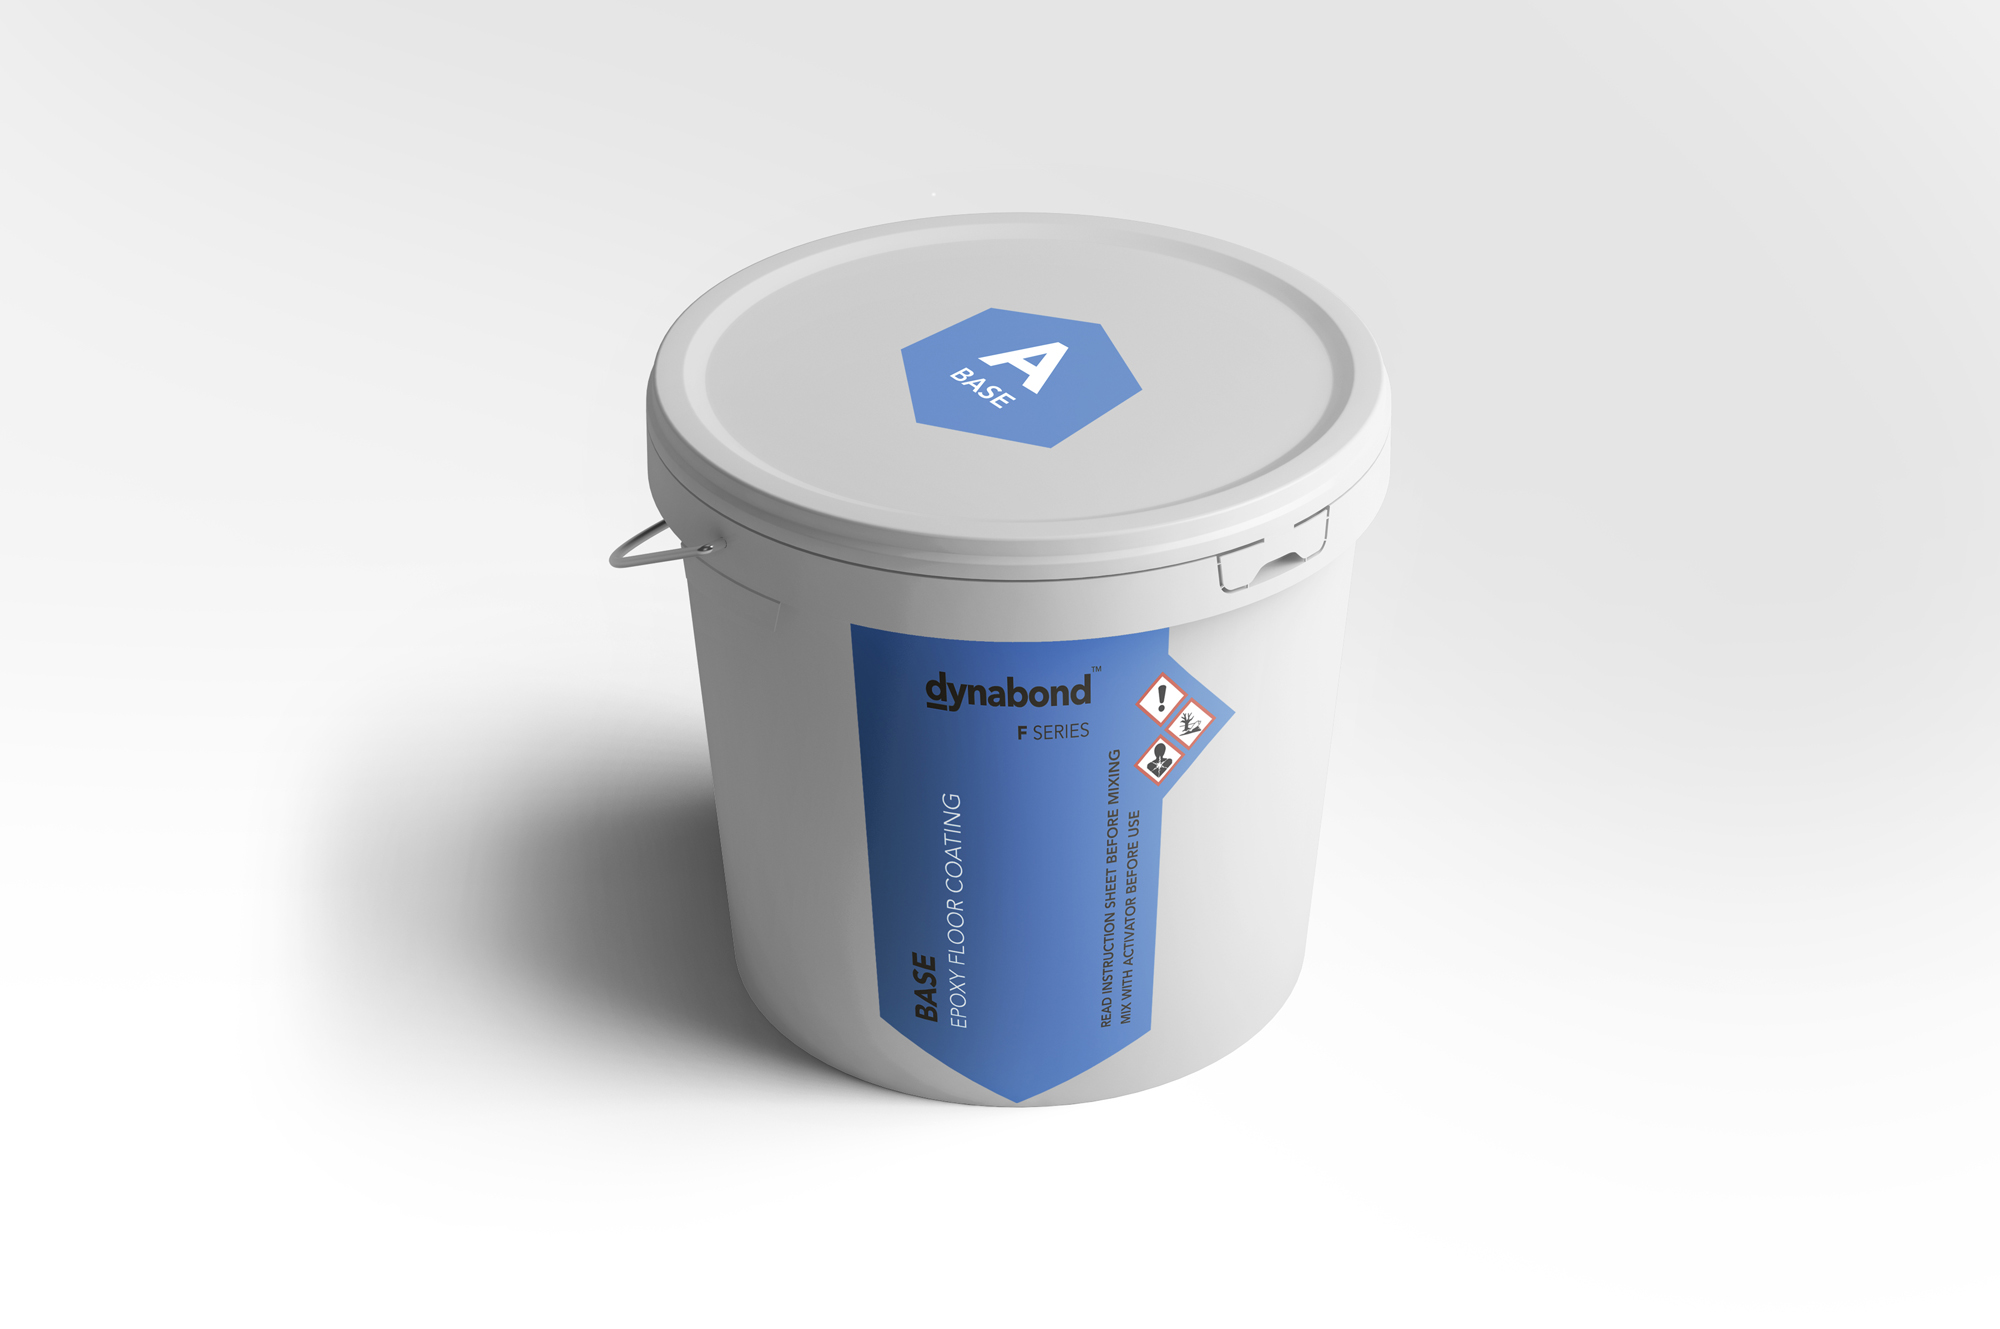 dynabond bucket